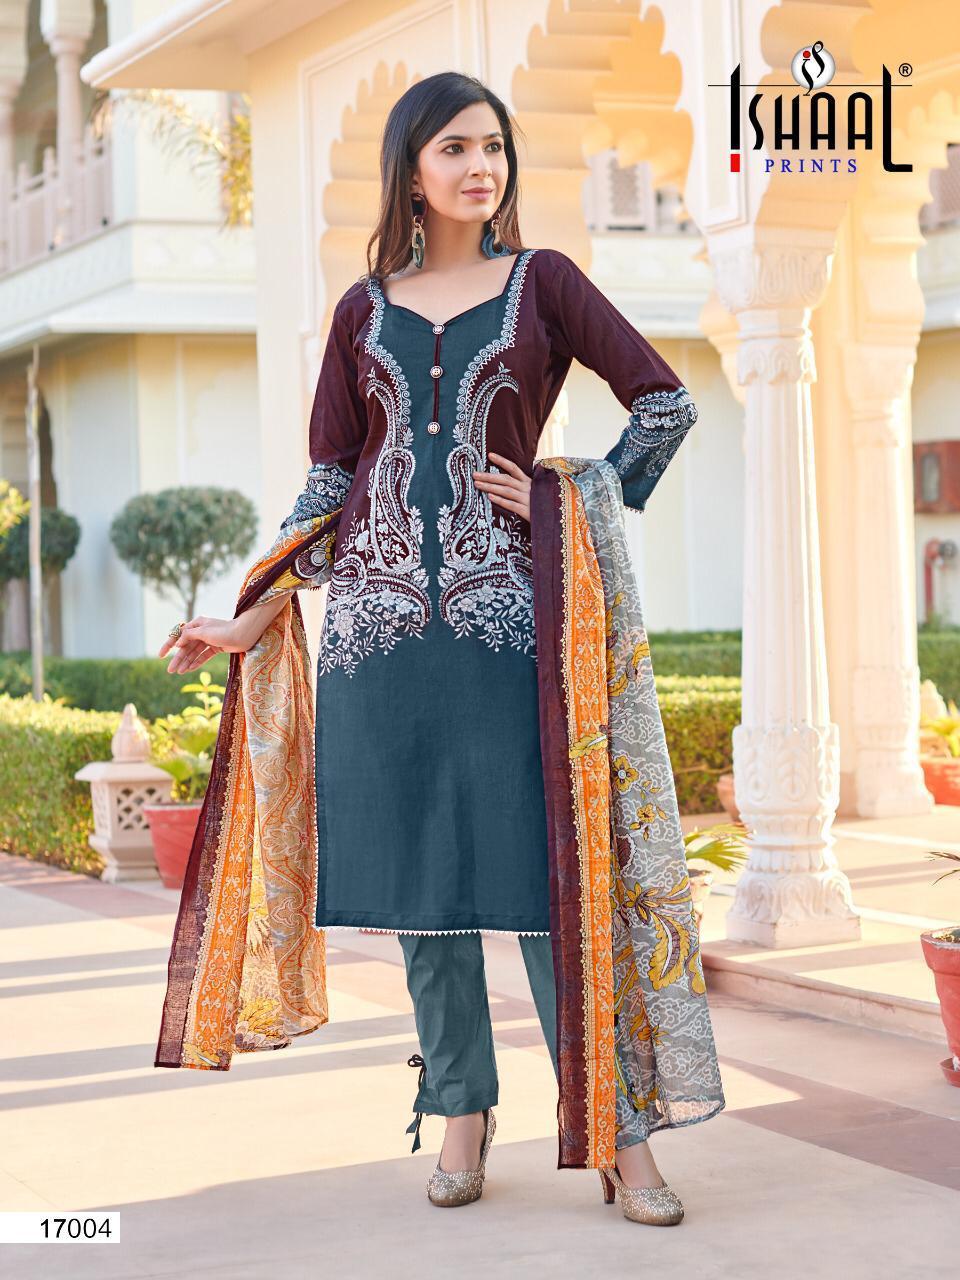 Ishaal Gulmohar Vol 17 Salwar Suit Wholesale Catalog 10 Pcs 6 - Ishaal Gulmohar Vol 17 Salwar Suit Wholesale Catalog 10 Pcs